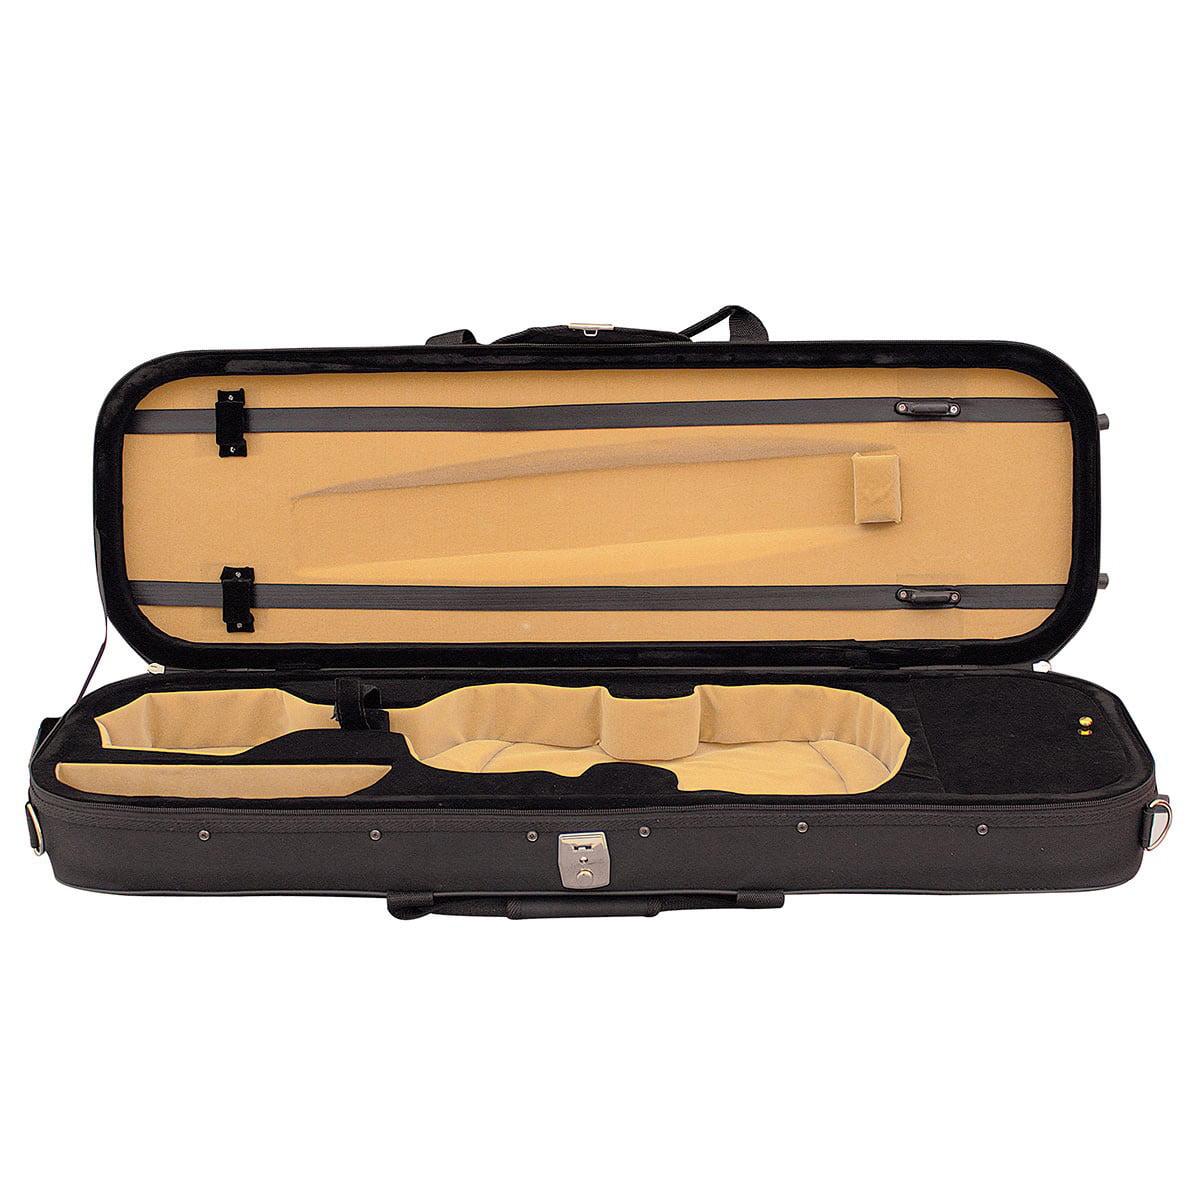 Hidersine Case Violin 4/4 Light Oblong VC206 open